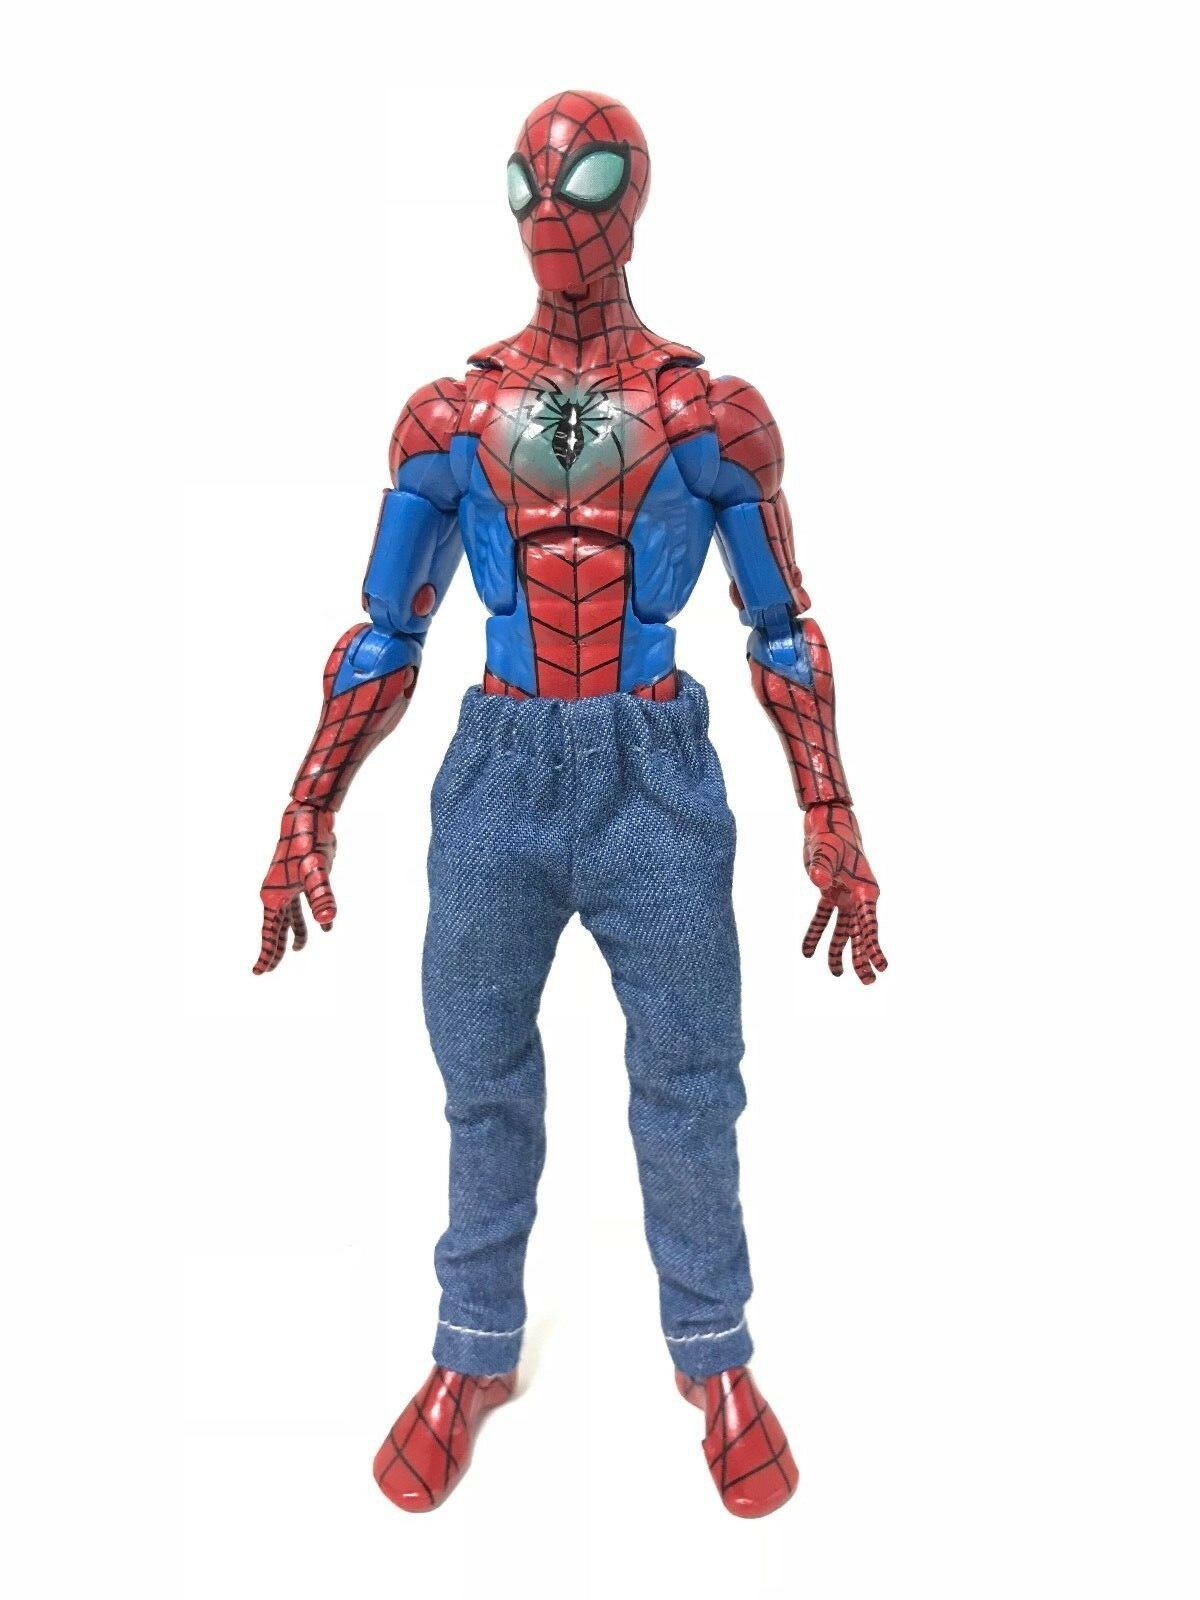 OZ-JEANS: FIGLOT 1/12 scale Slim Jeans for Marvel Legends Sp